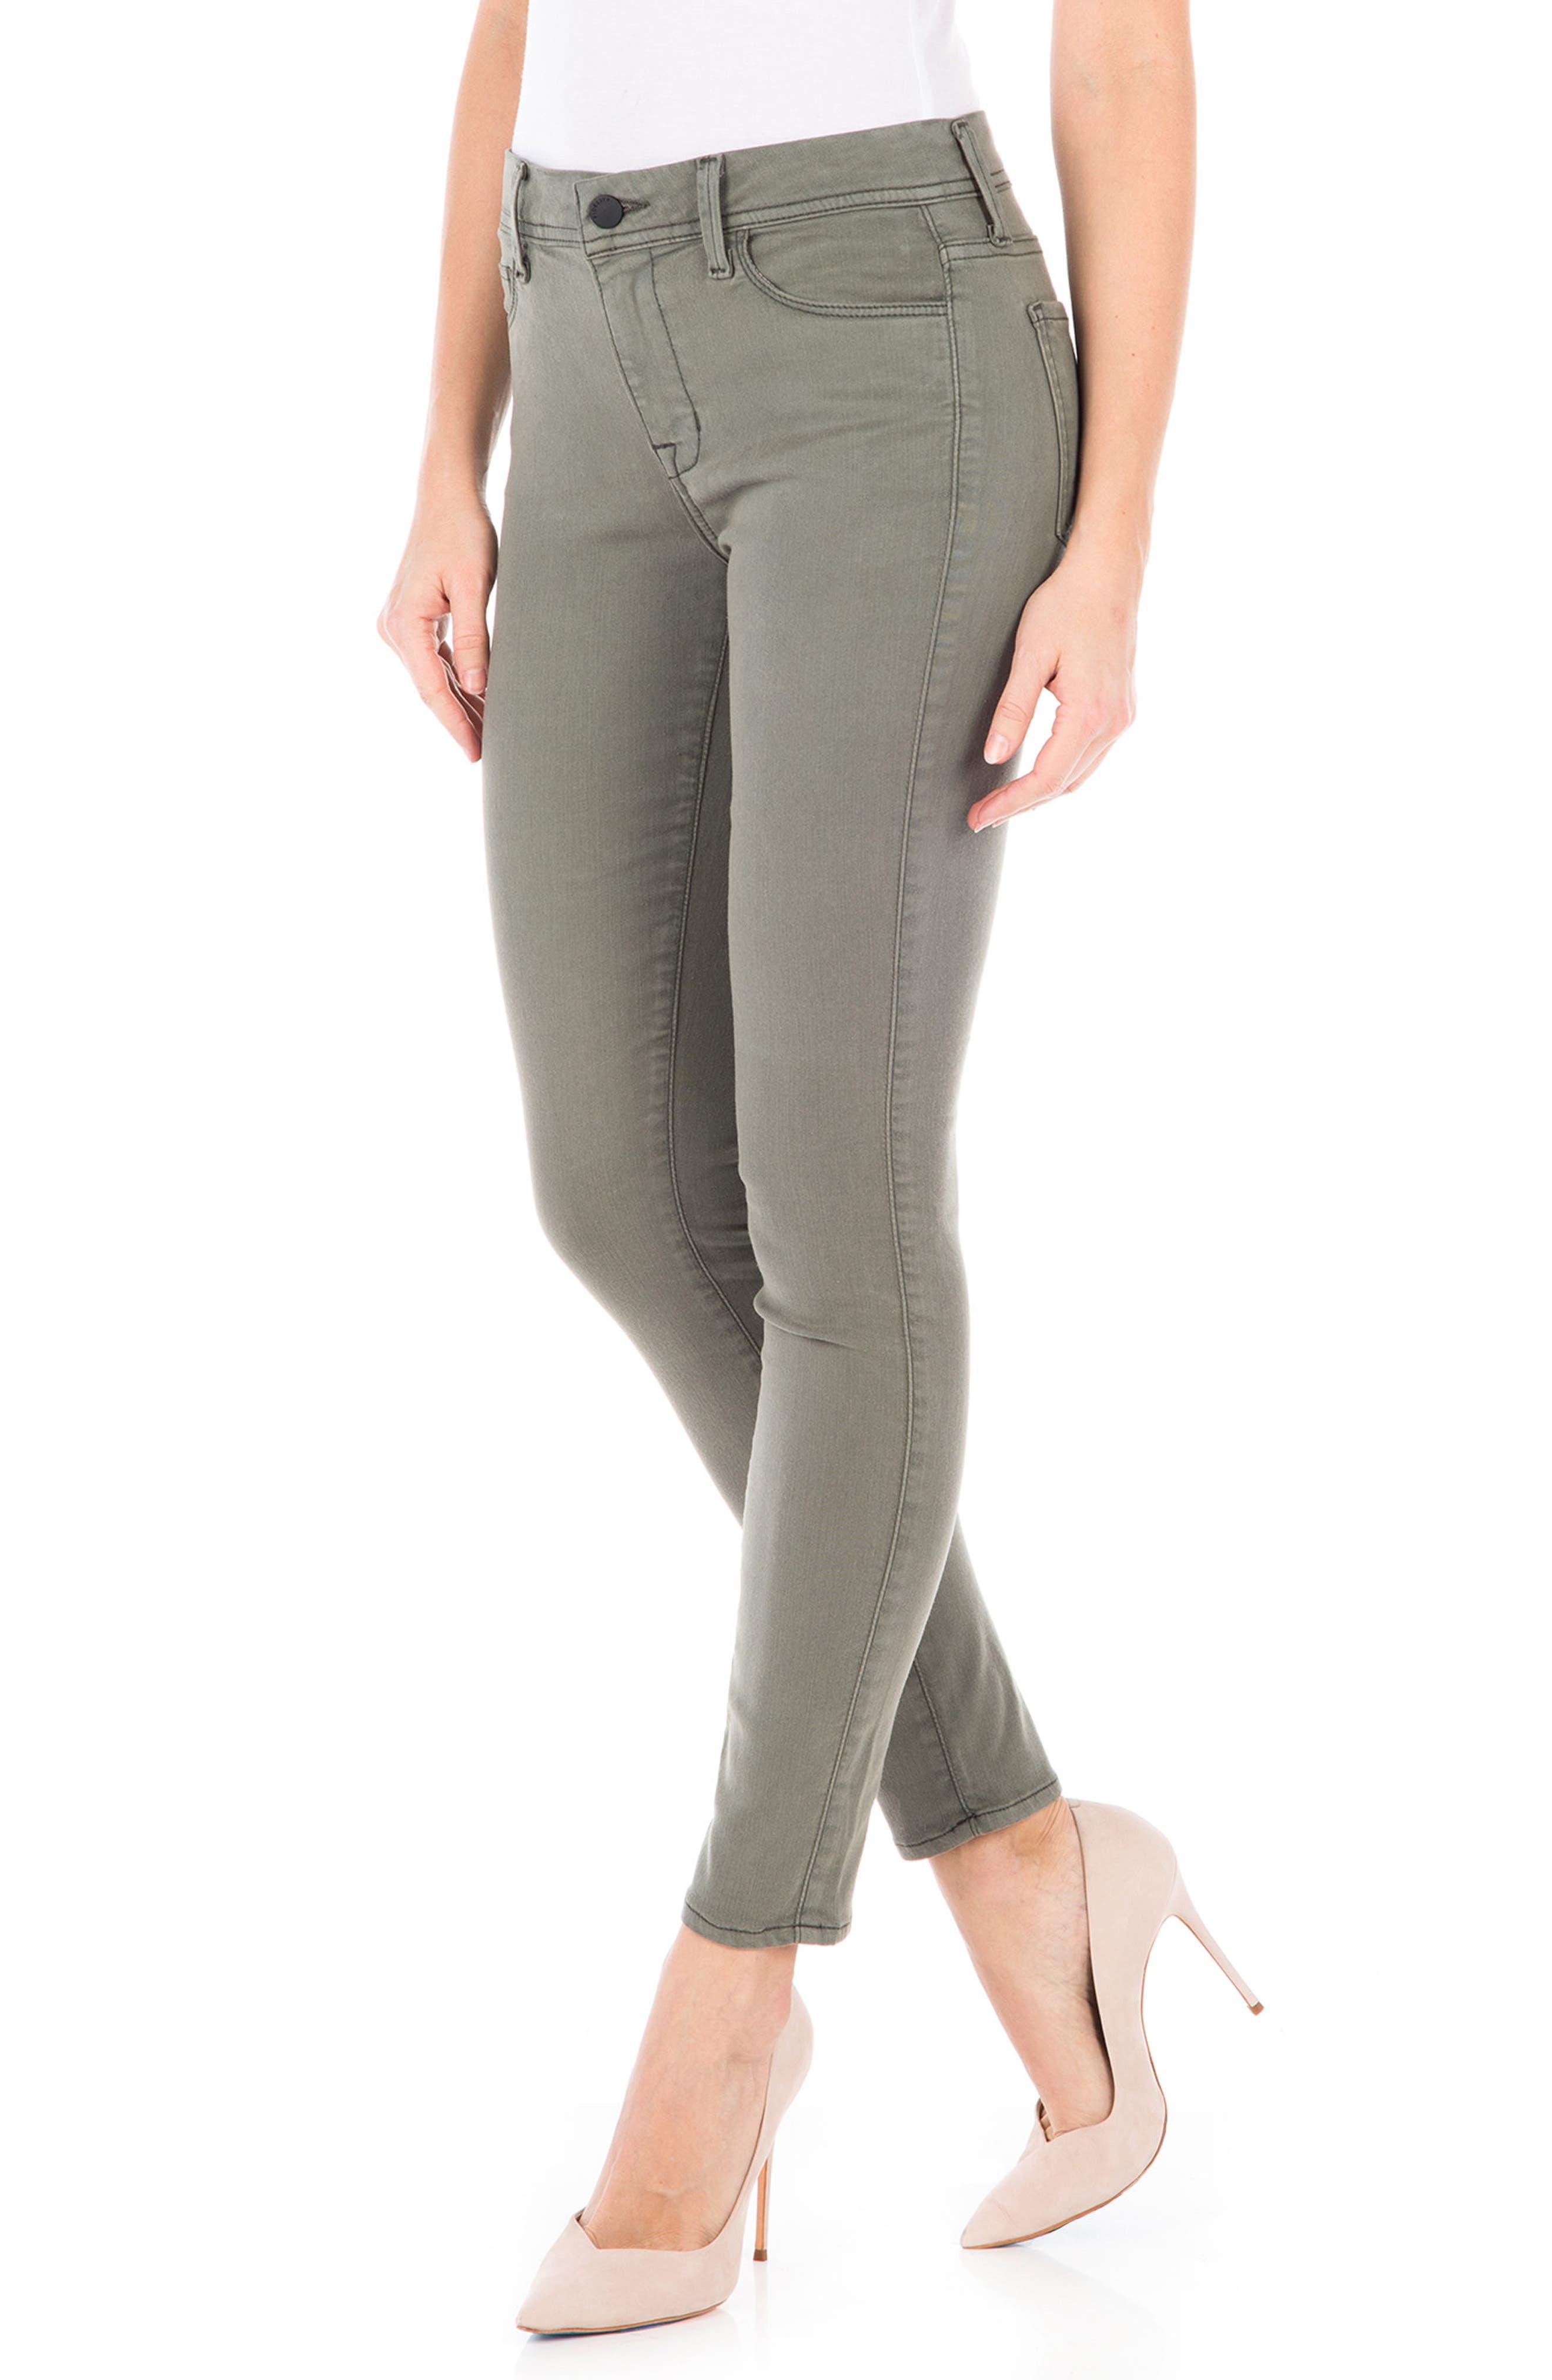 Sola Skinny Jeans,                             Alternate thumbnail 3, color,                             300